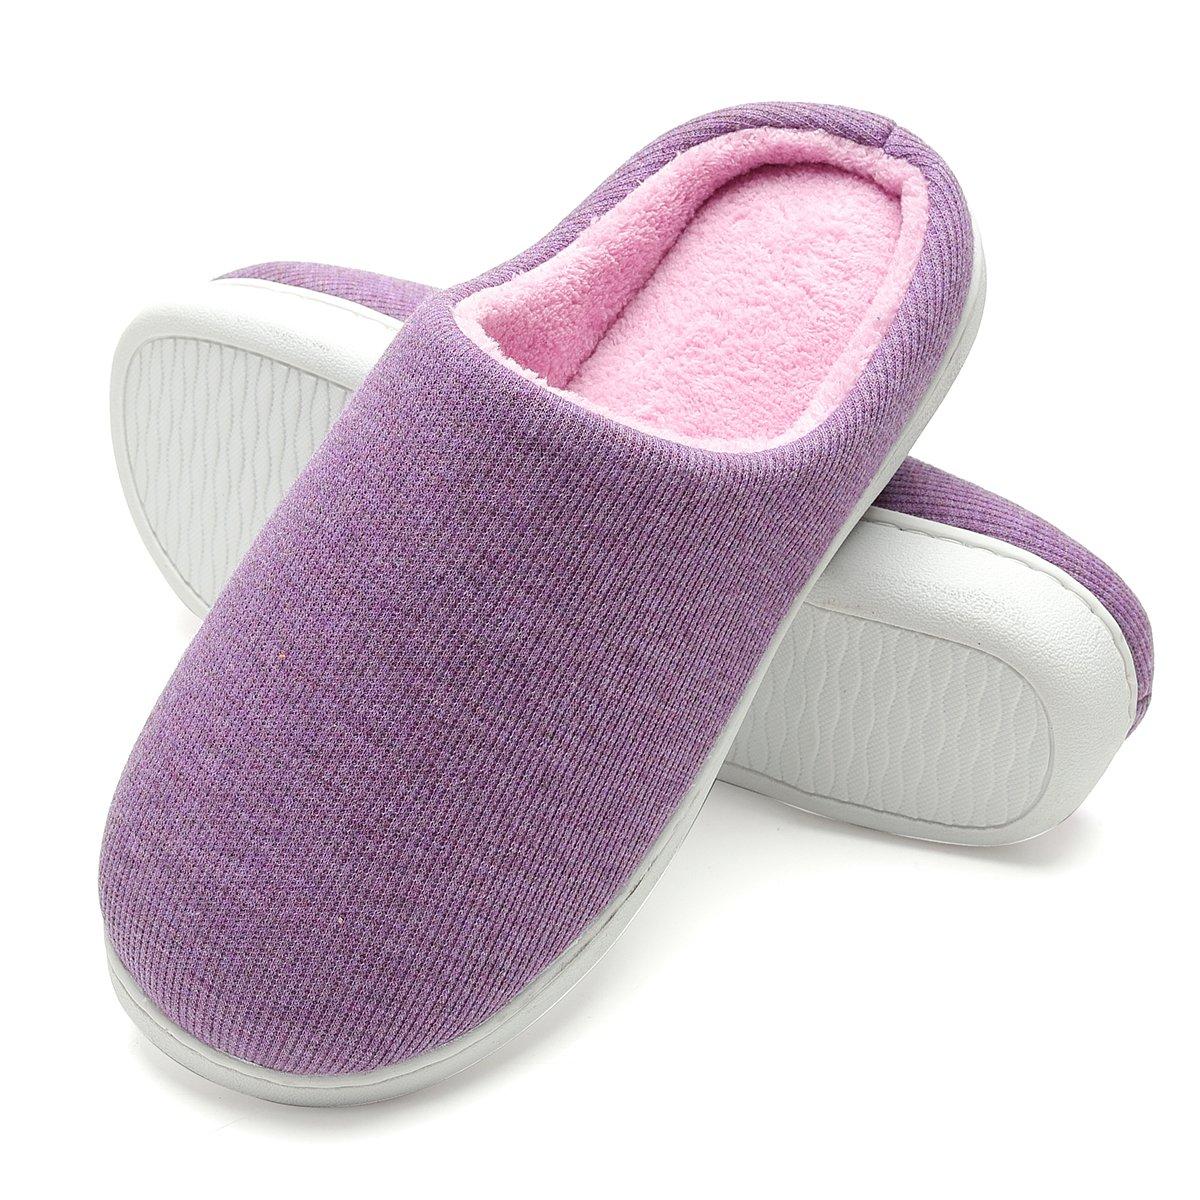 25a4b7e4370 FLY HAWK Women s Memory Foam Plush House Slippers Two-Tone Slip On Indoor Outdoor  Shoes CAMJL07034 women